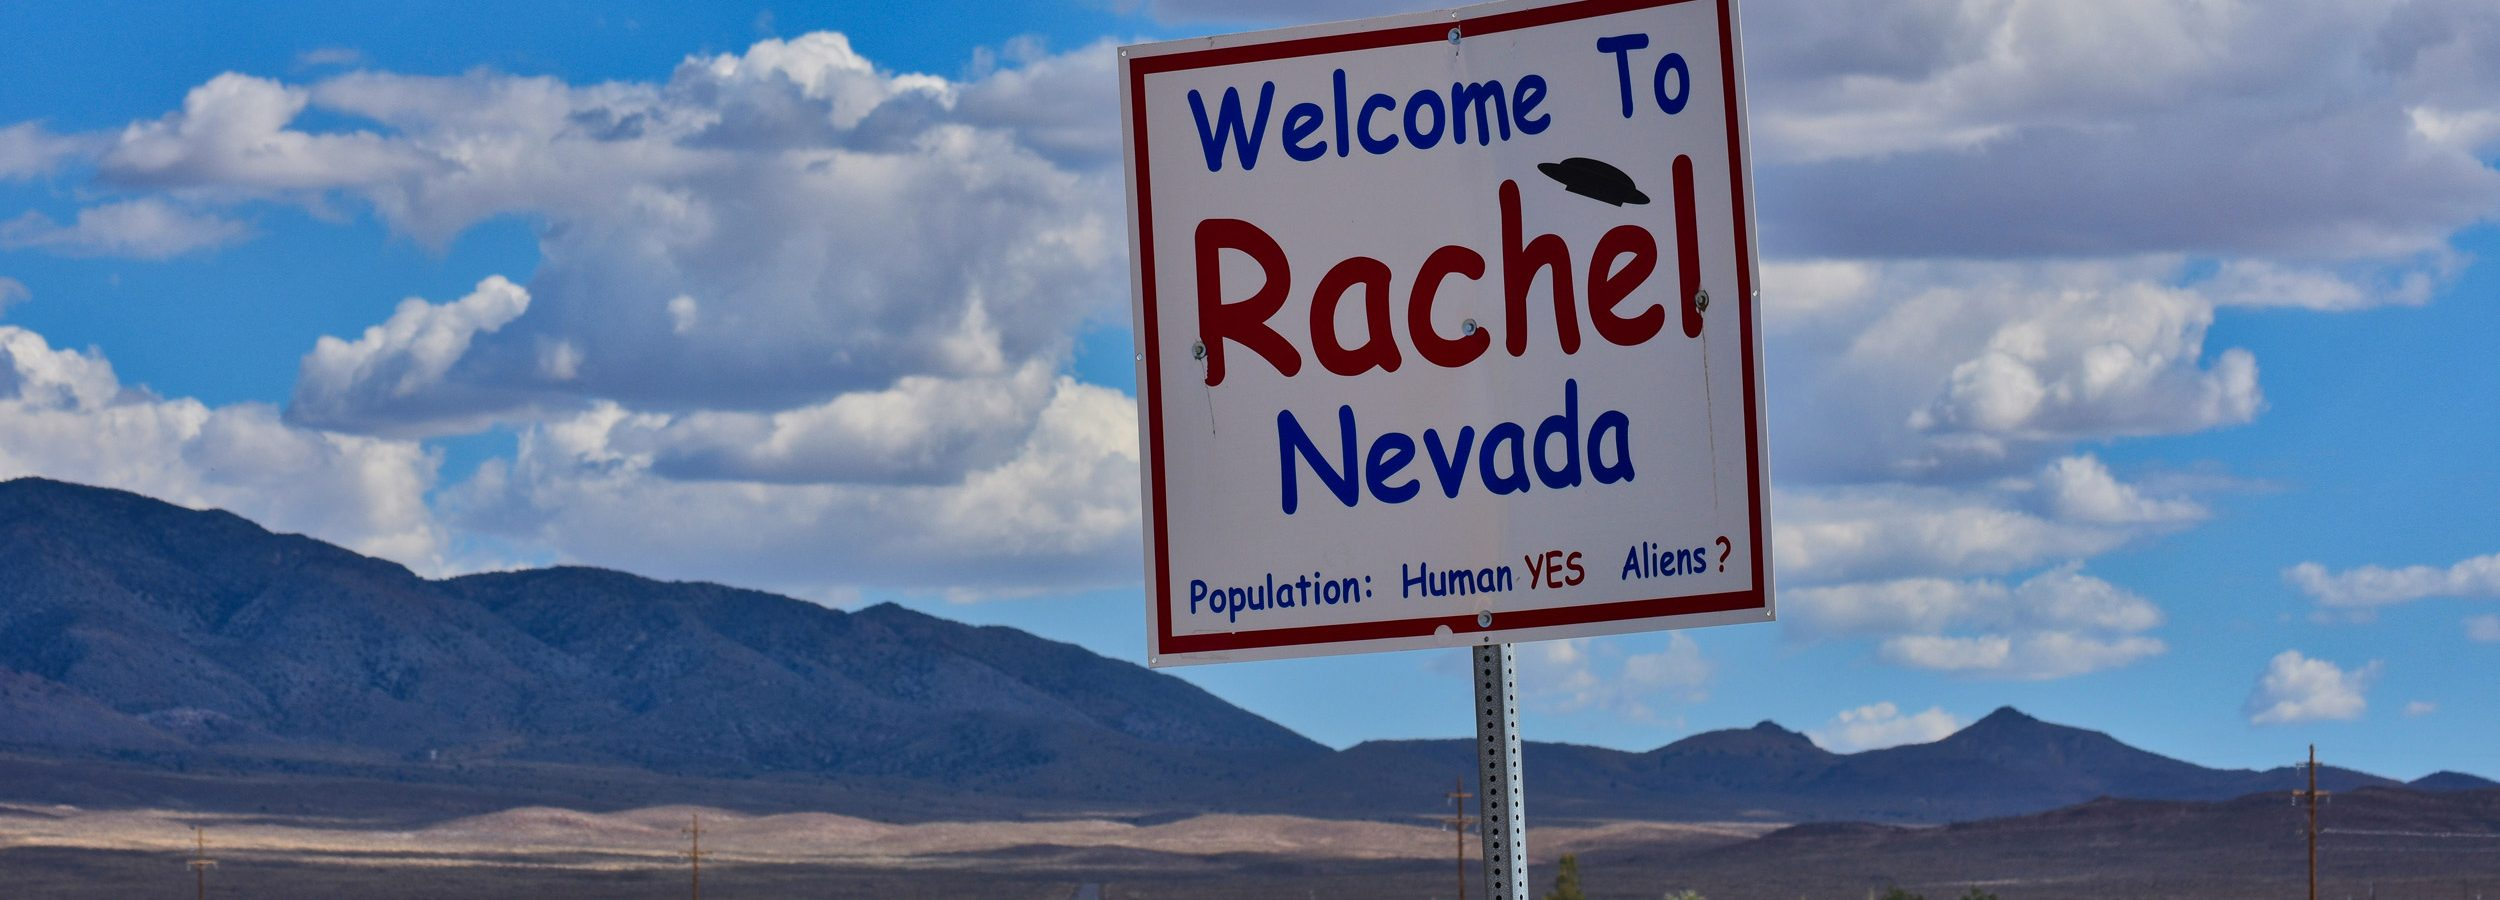 Welcome to Rachel, Nevada :)